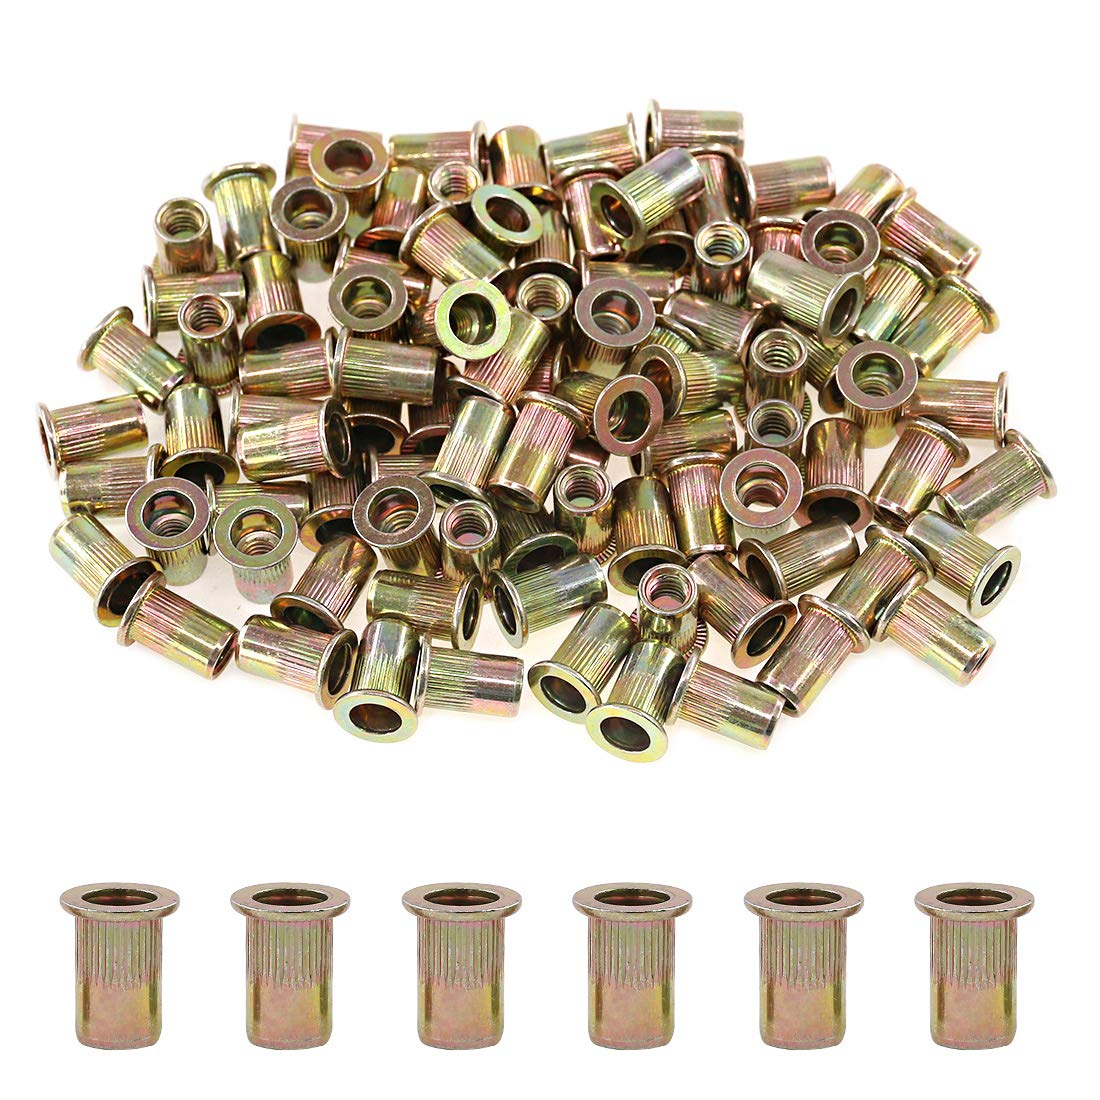 Rivet Nut 100 Pieces 10-24UNC Carbon Steel Flat Head Rivnut Threaded Insert